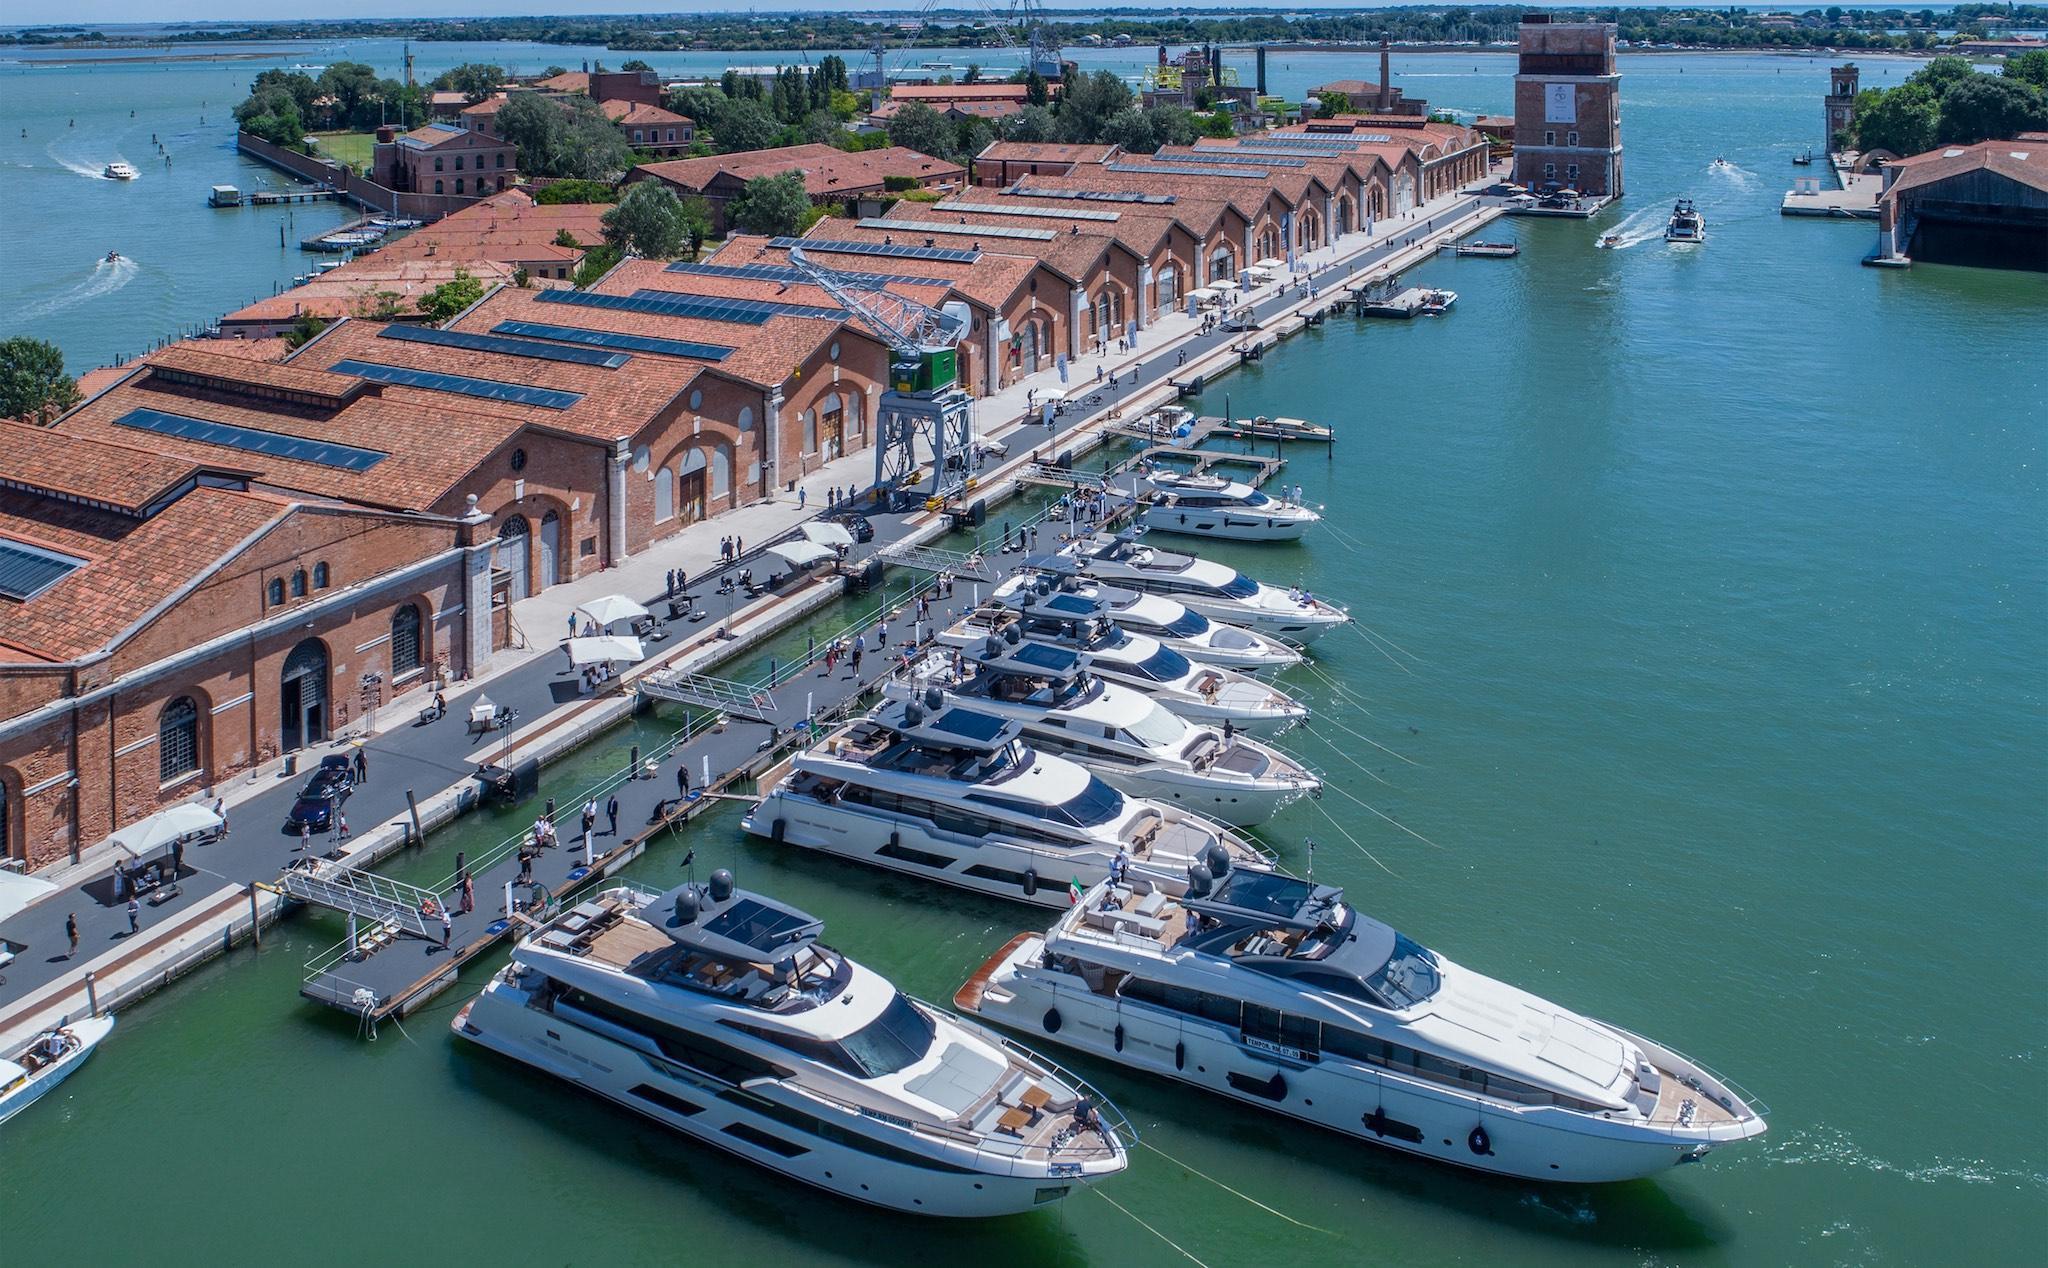 eBlue_economy_معرض فينيسيا الدولى للقوارب